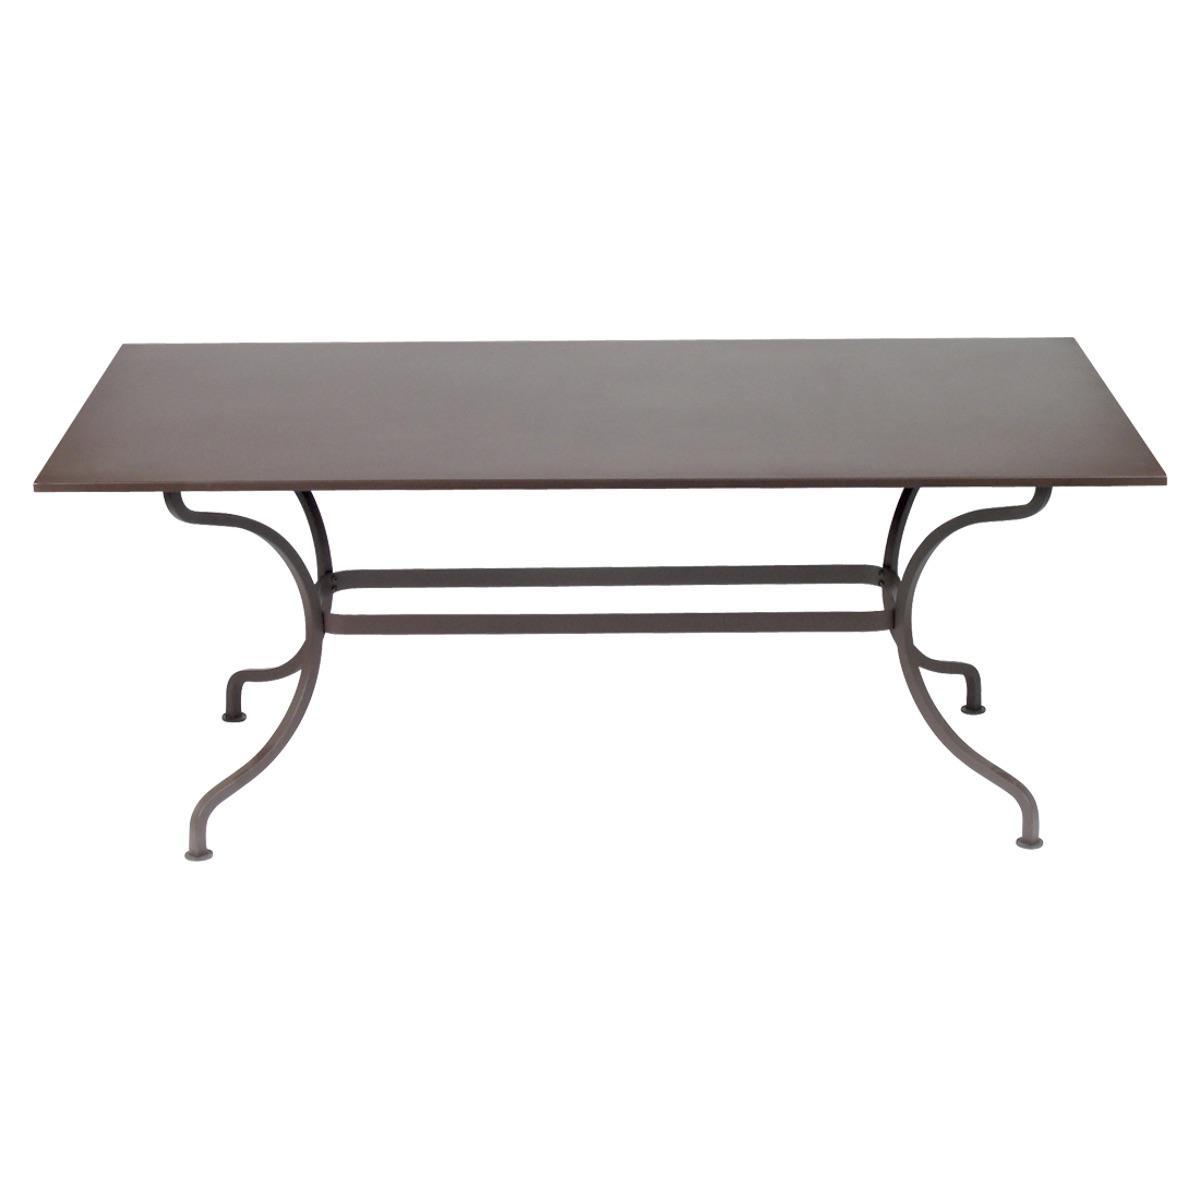 Table 180x100cm ROMANE Fermob brun rouille